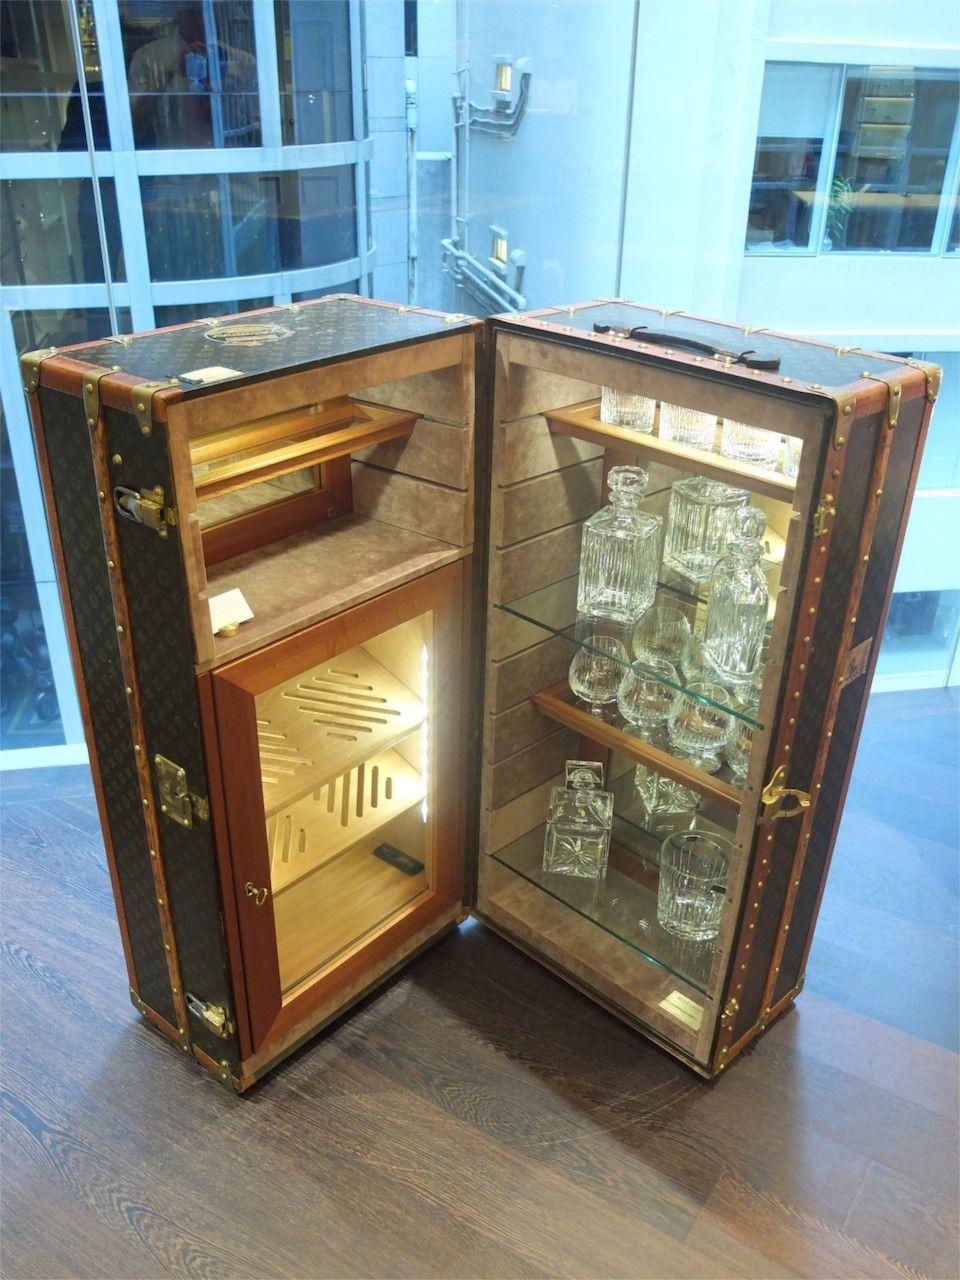 louis vuitton trunk transformed into a bar lv love pinterest louis vuitton bar and. Black Bedroom Furniture Sets. Home Design Ideas